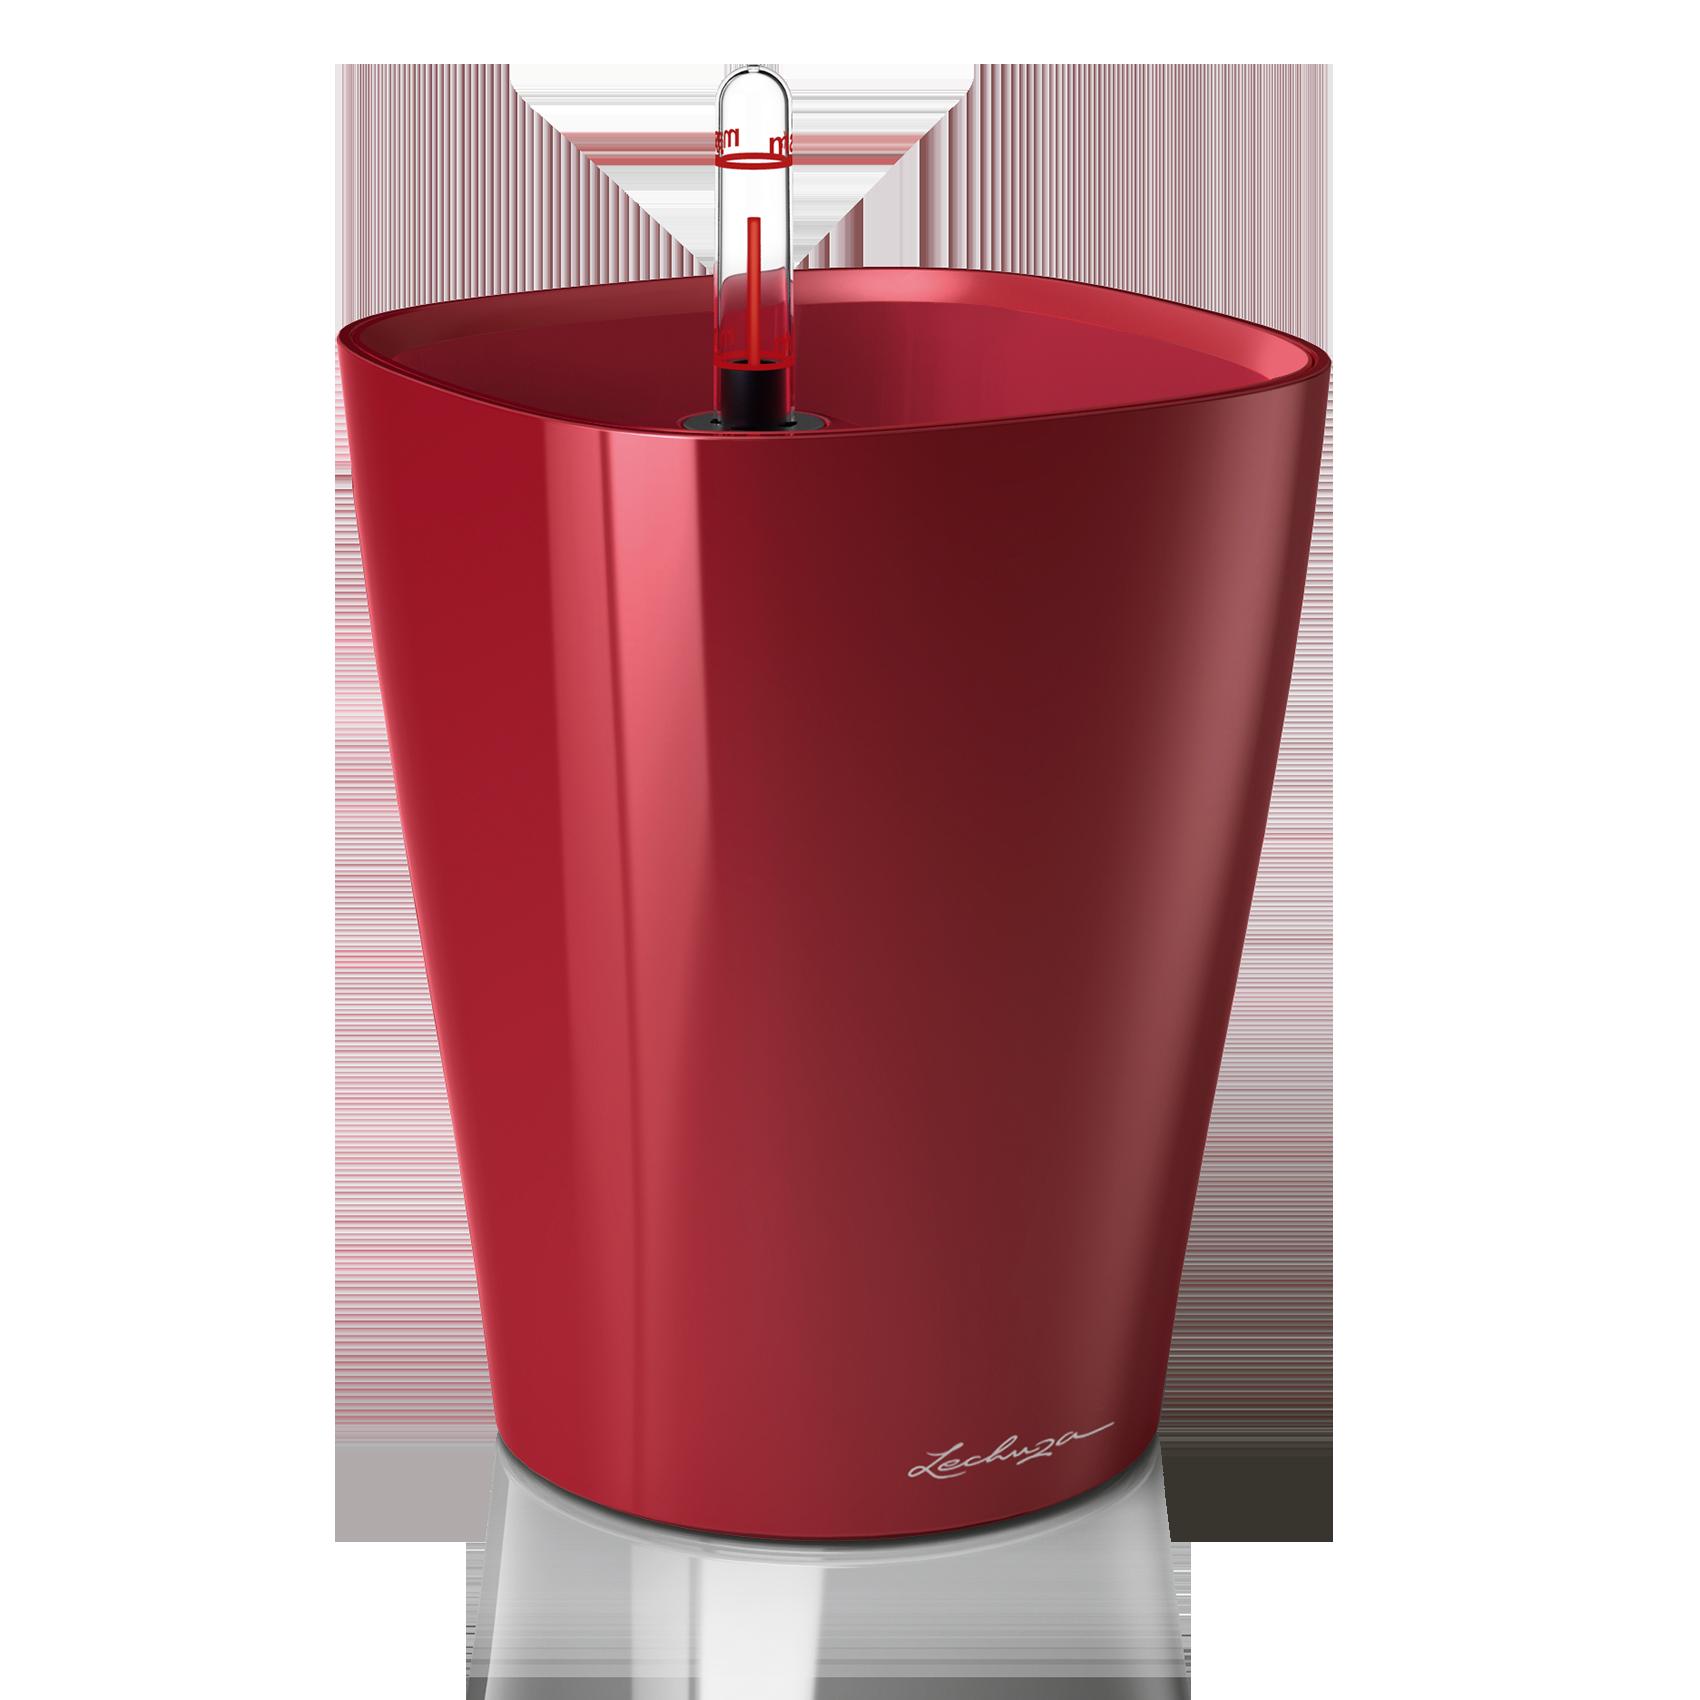 DELTINI scarlet red high-gloss